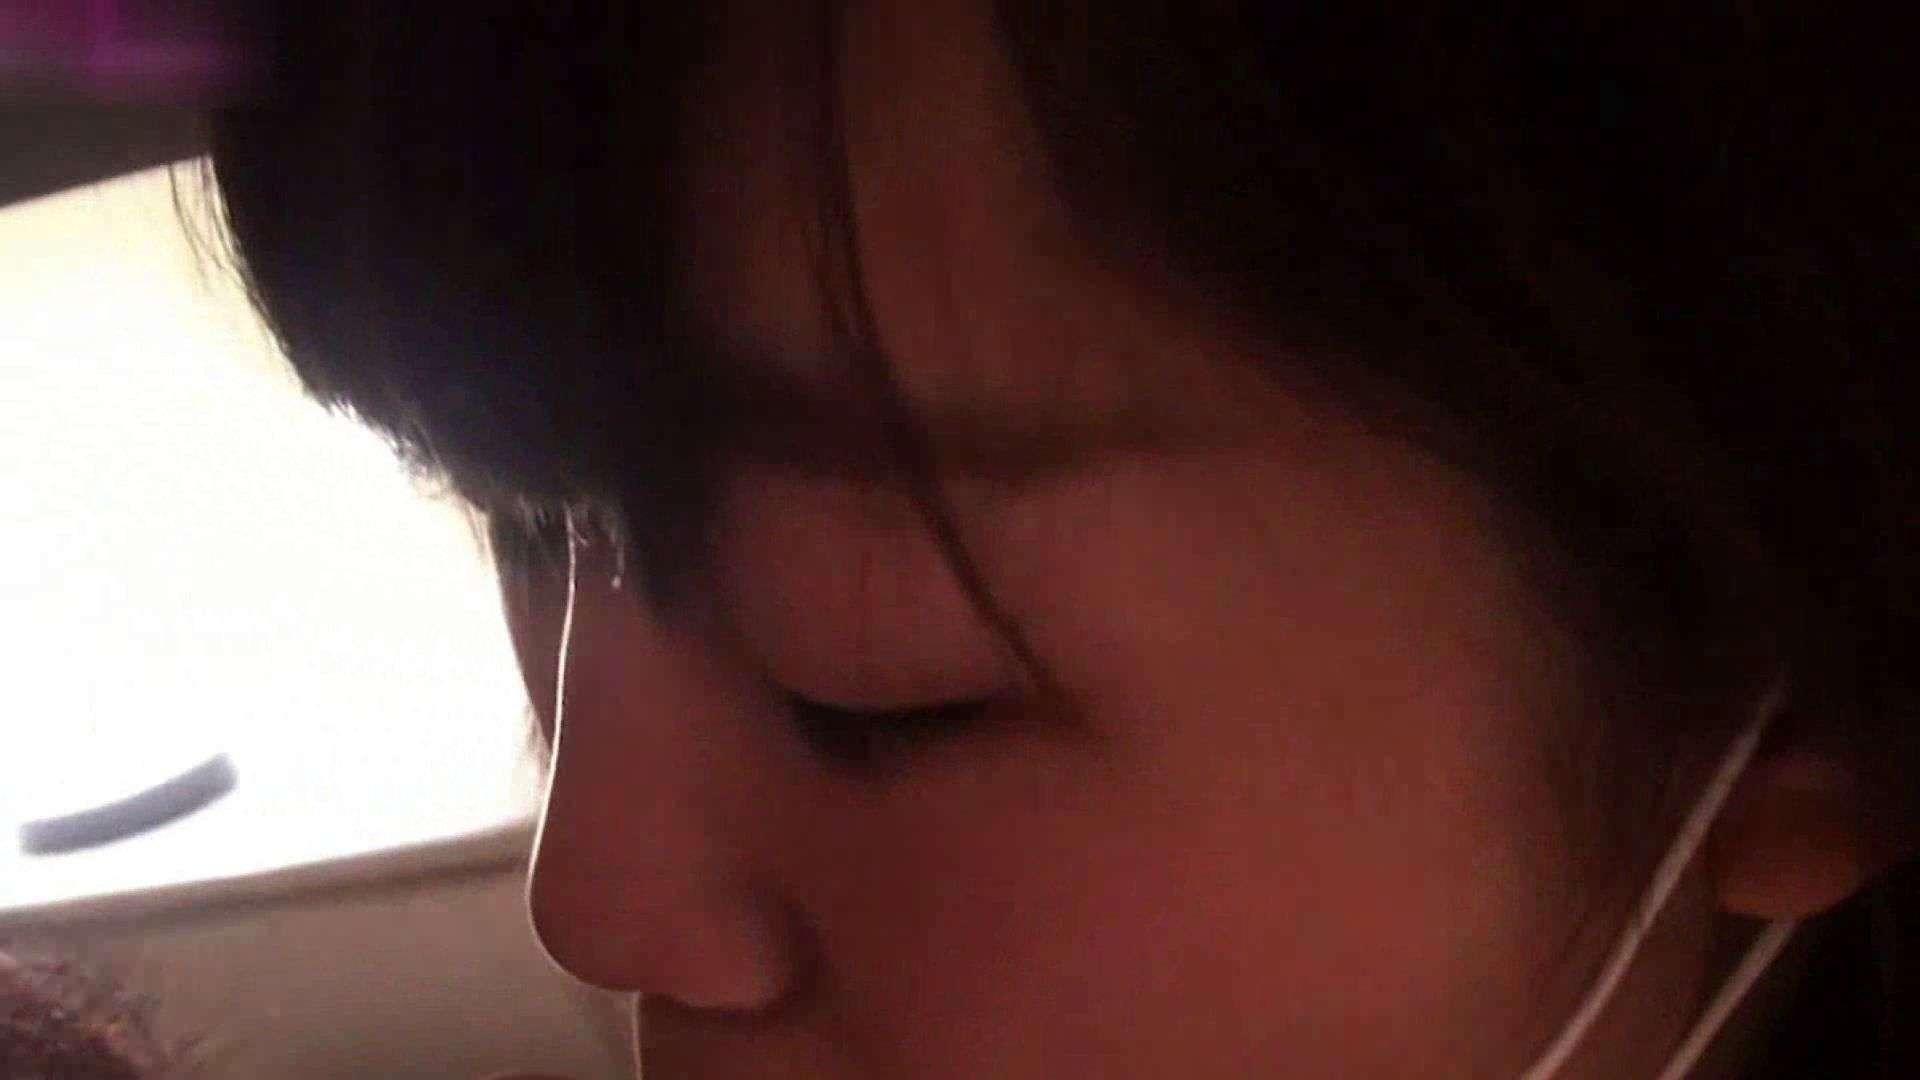 S級厳選美女ビッチガールVol.23 SEX本番 ワレメ無修正動画無料 105画像 79